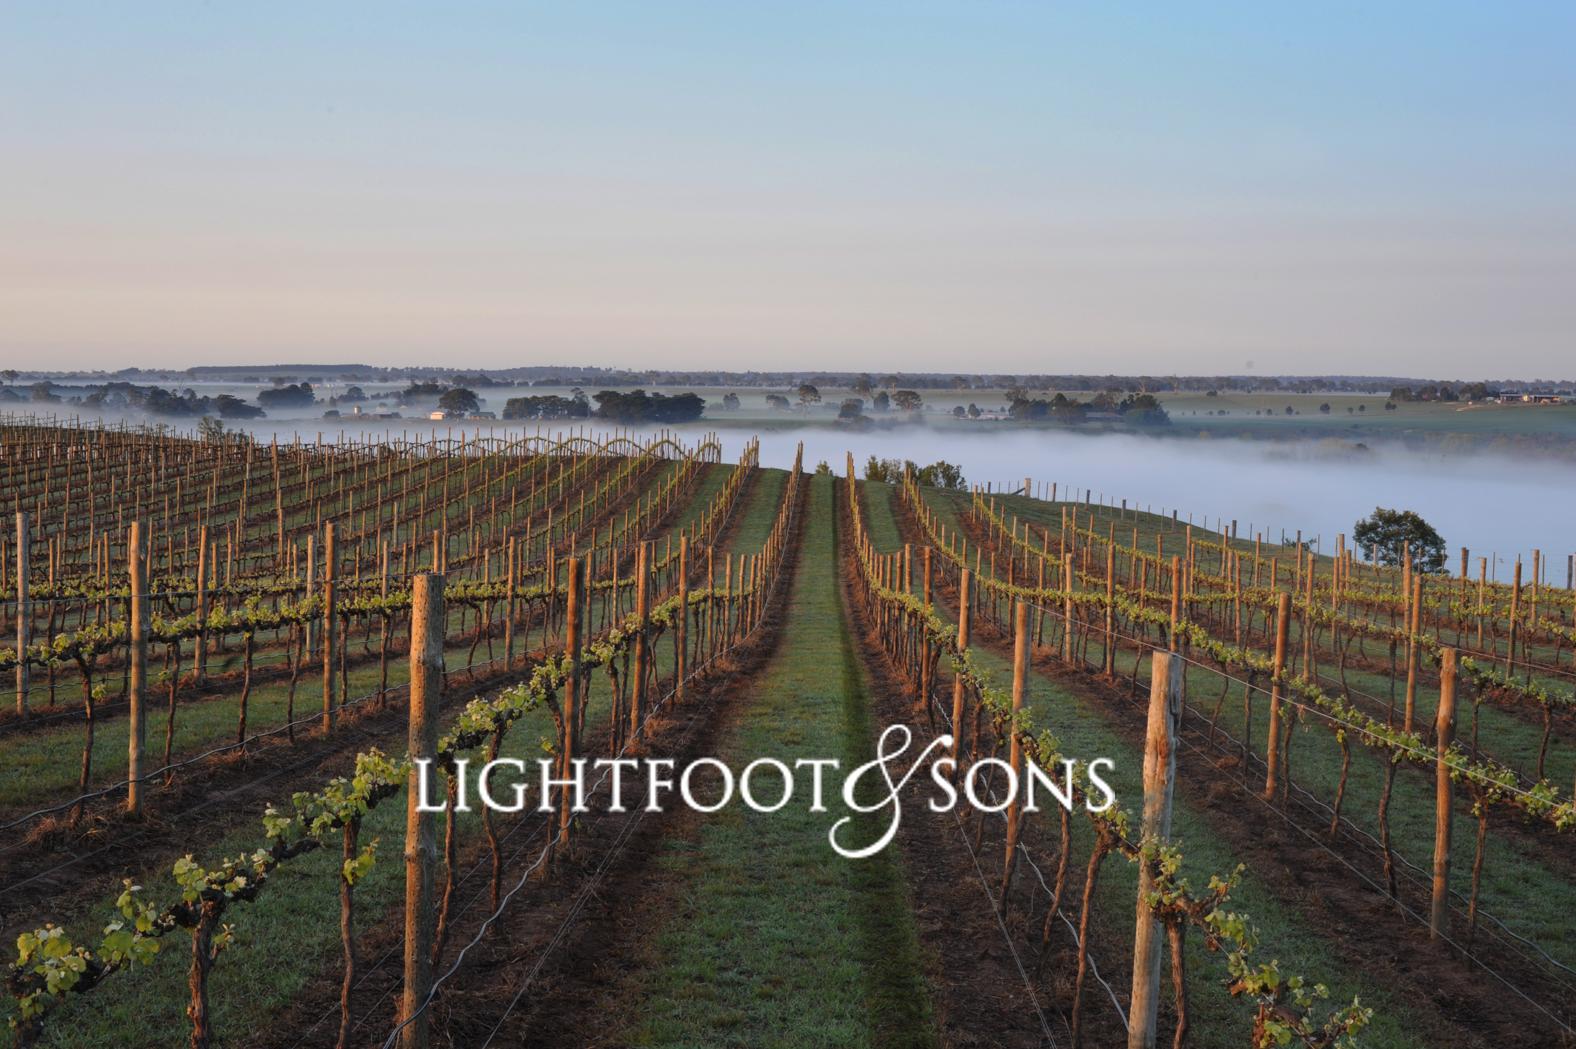 Lightfoot & Son